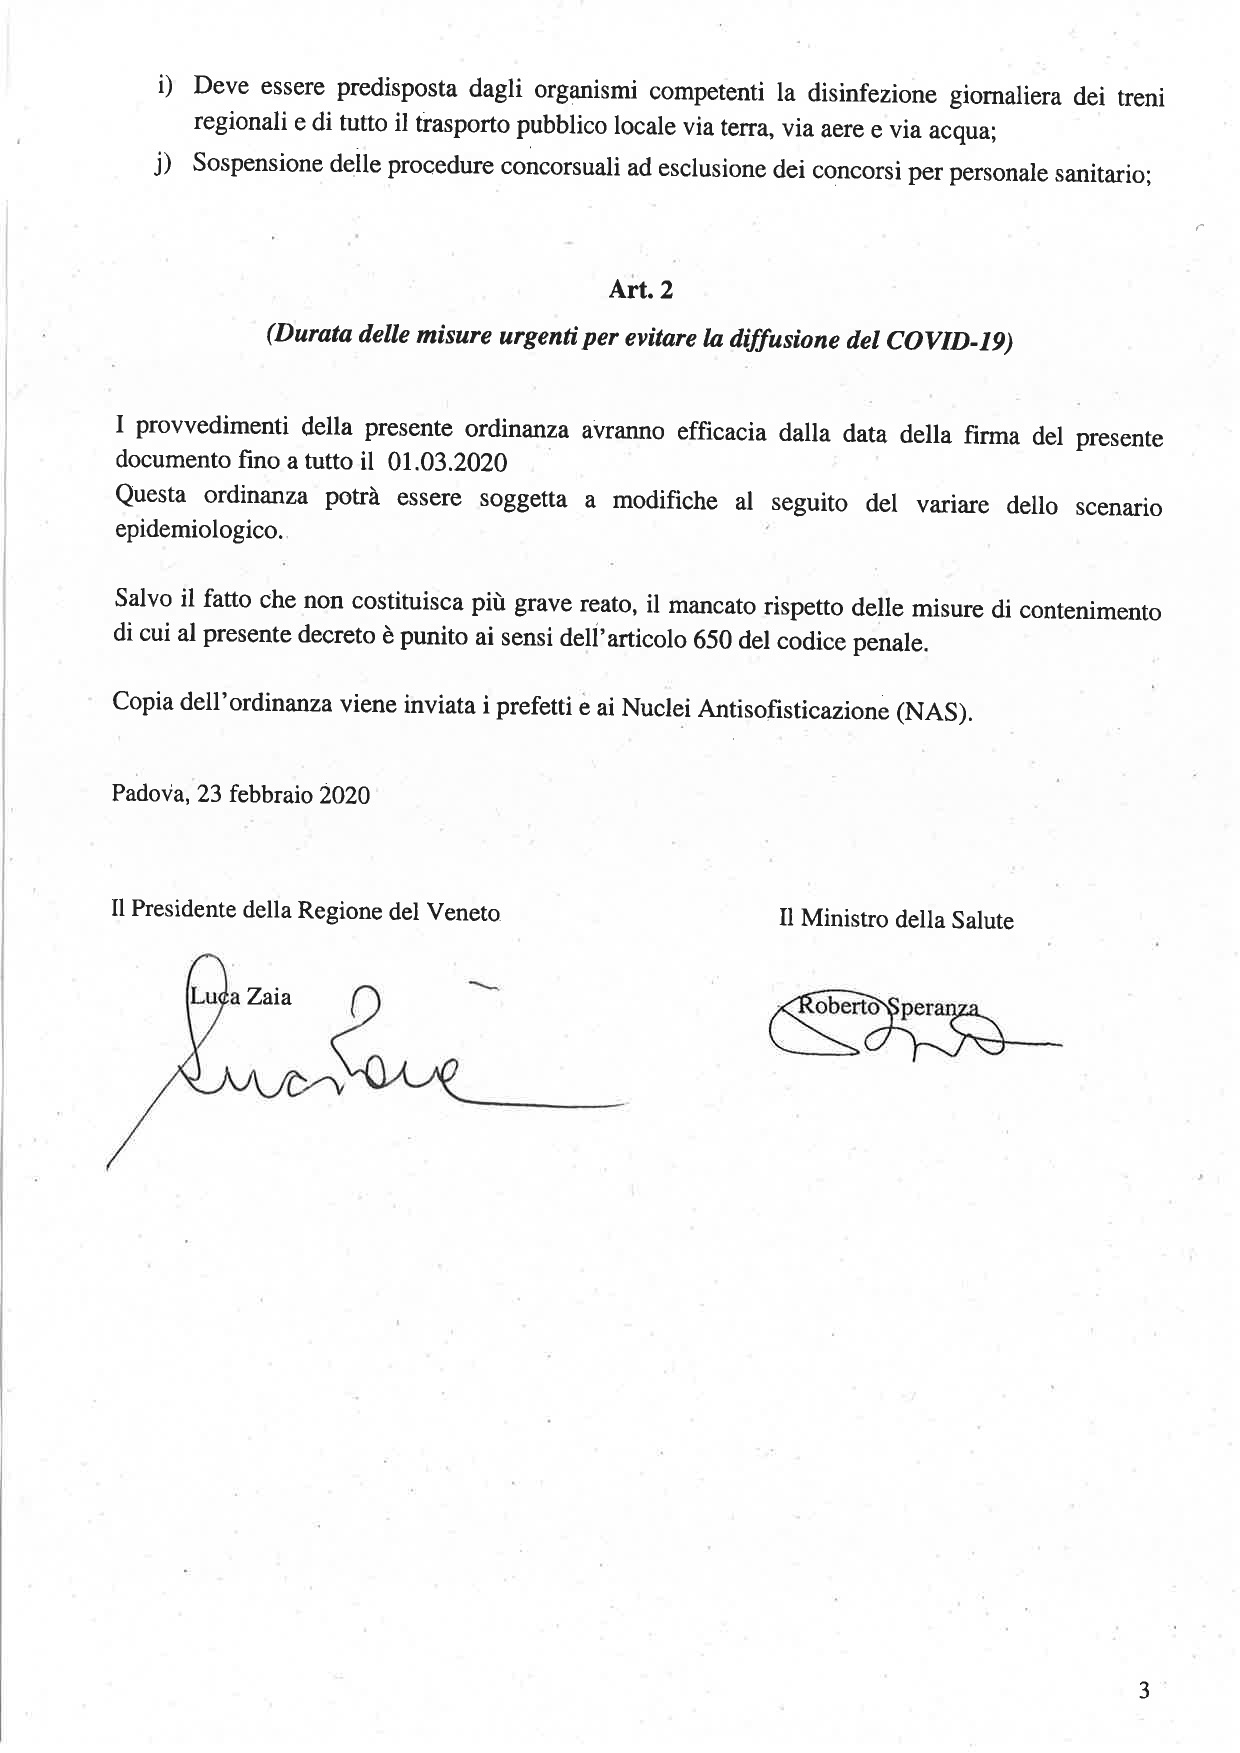 Ordinanza n. 1 23.02.2020